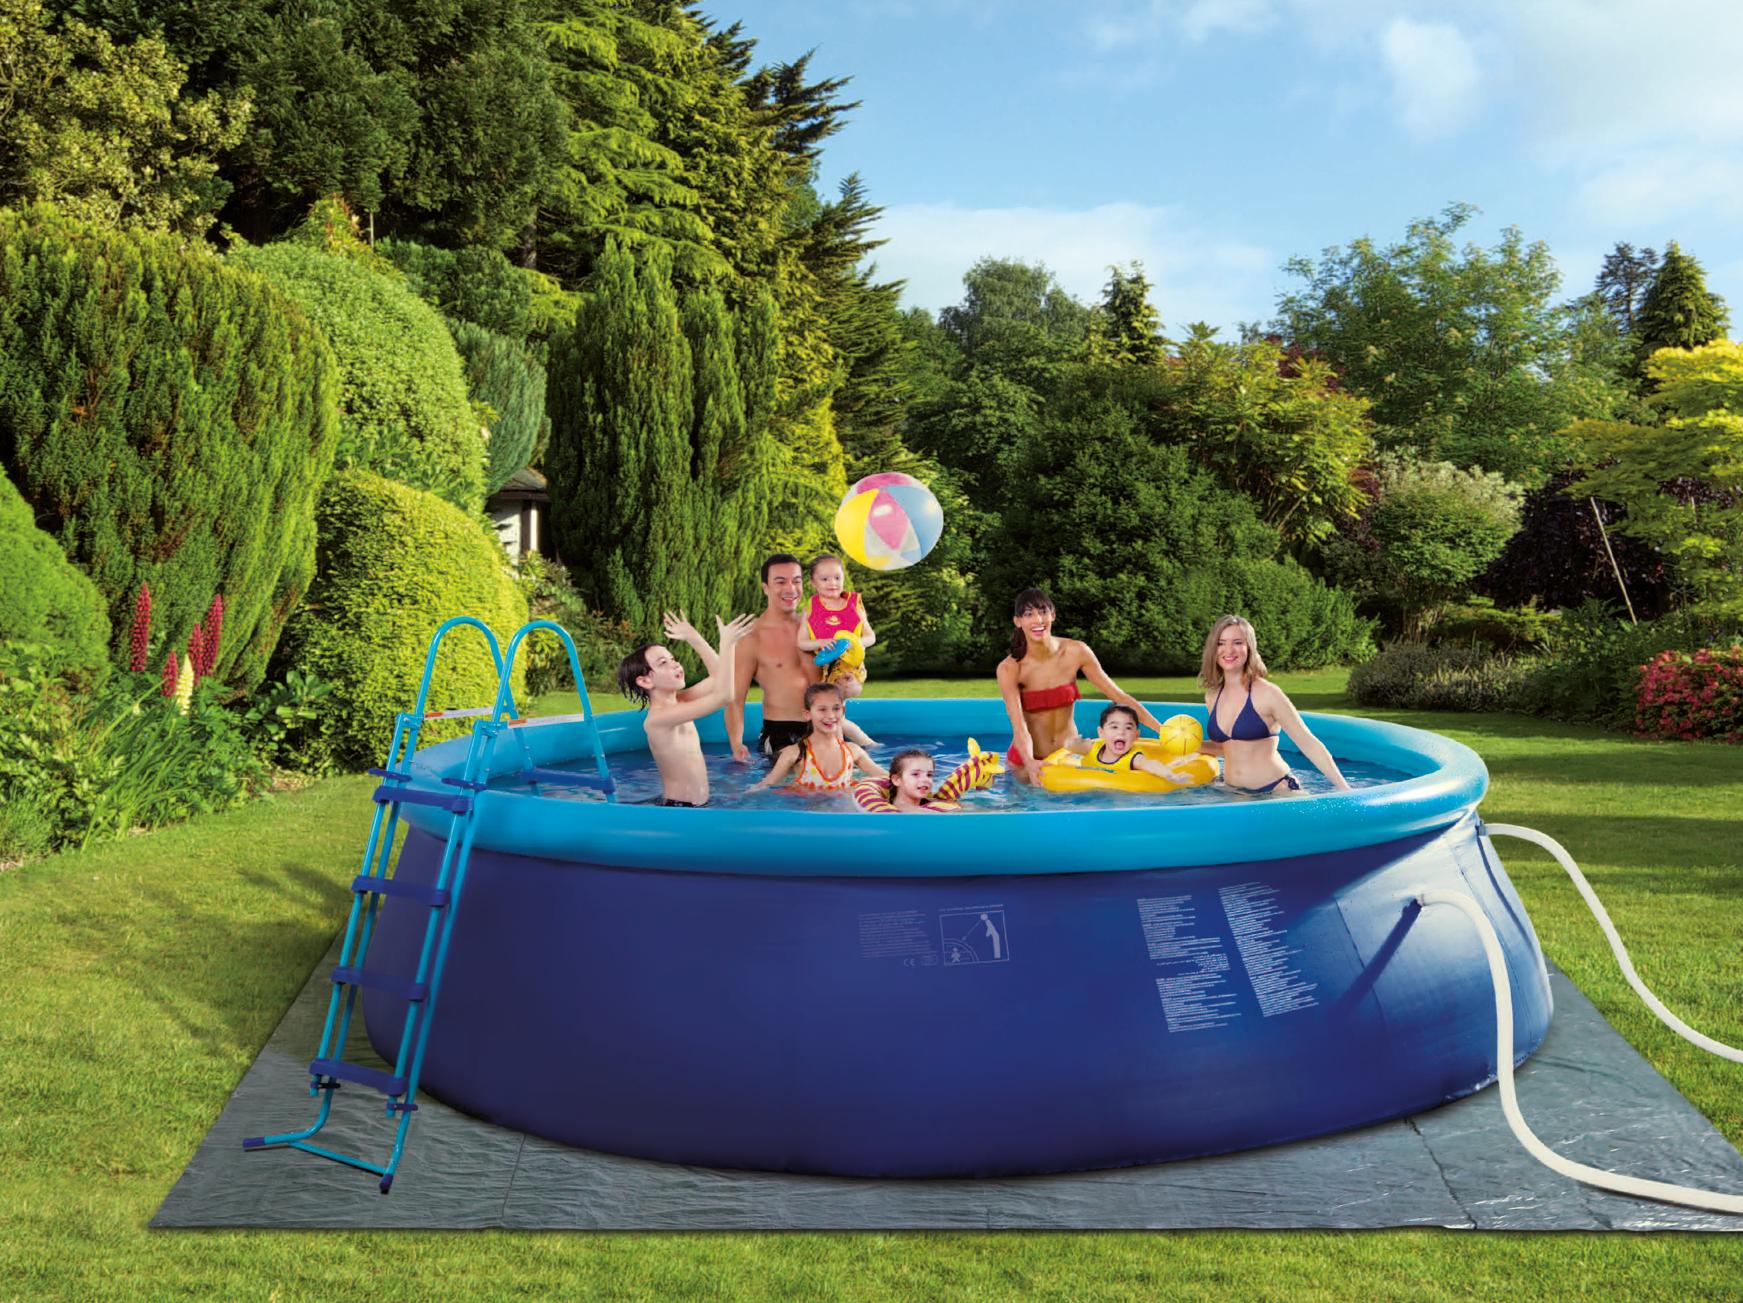 piscine hors sol carrefour prix nx03 humatraffin. Black Bedroom Furniture Sets. Home Design Ideas